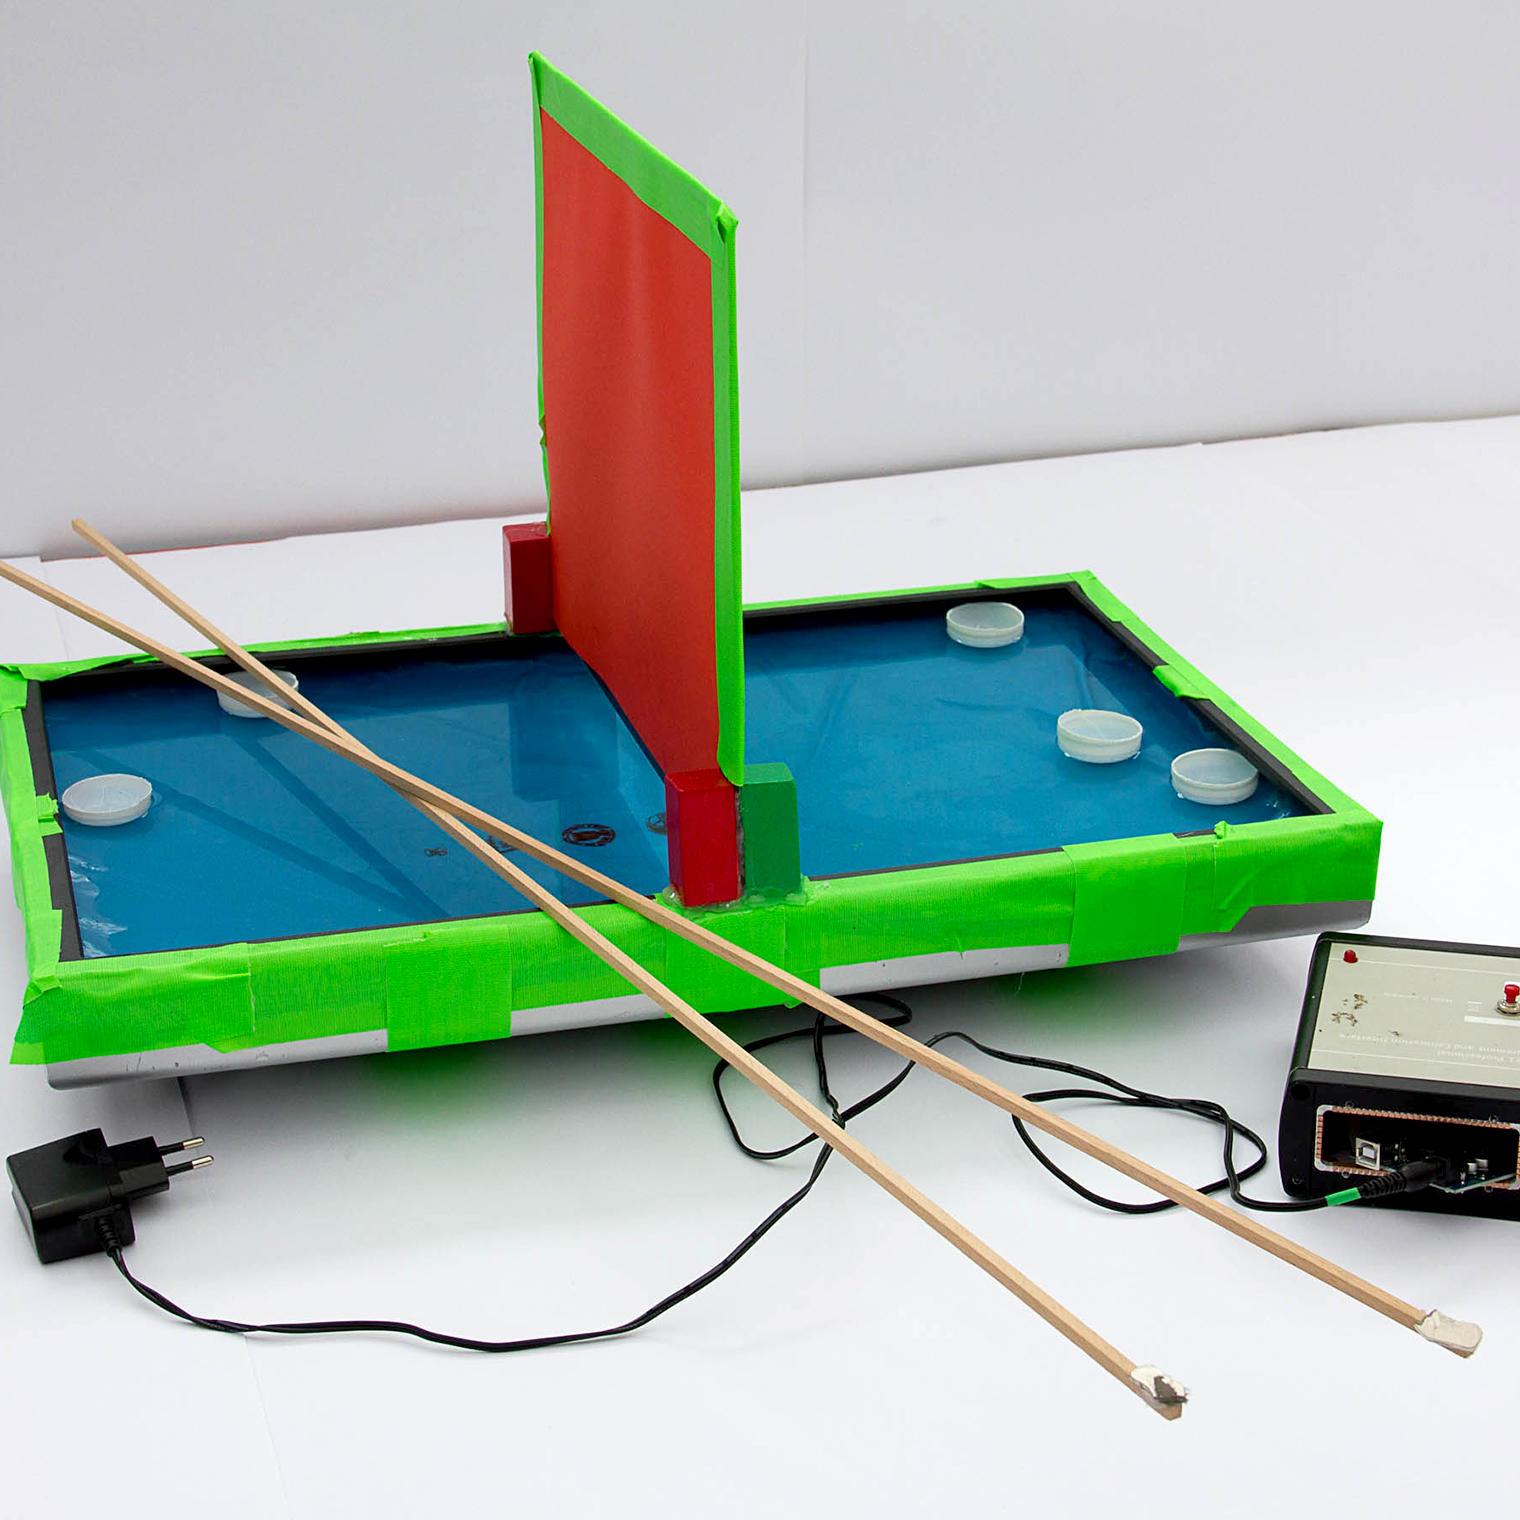 Arduino programmieren tuduu